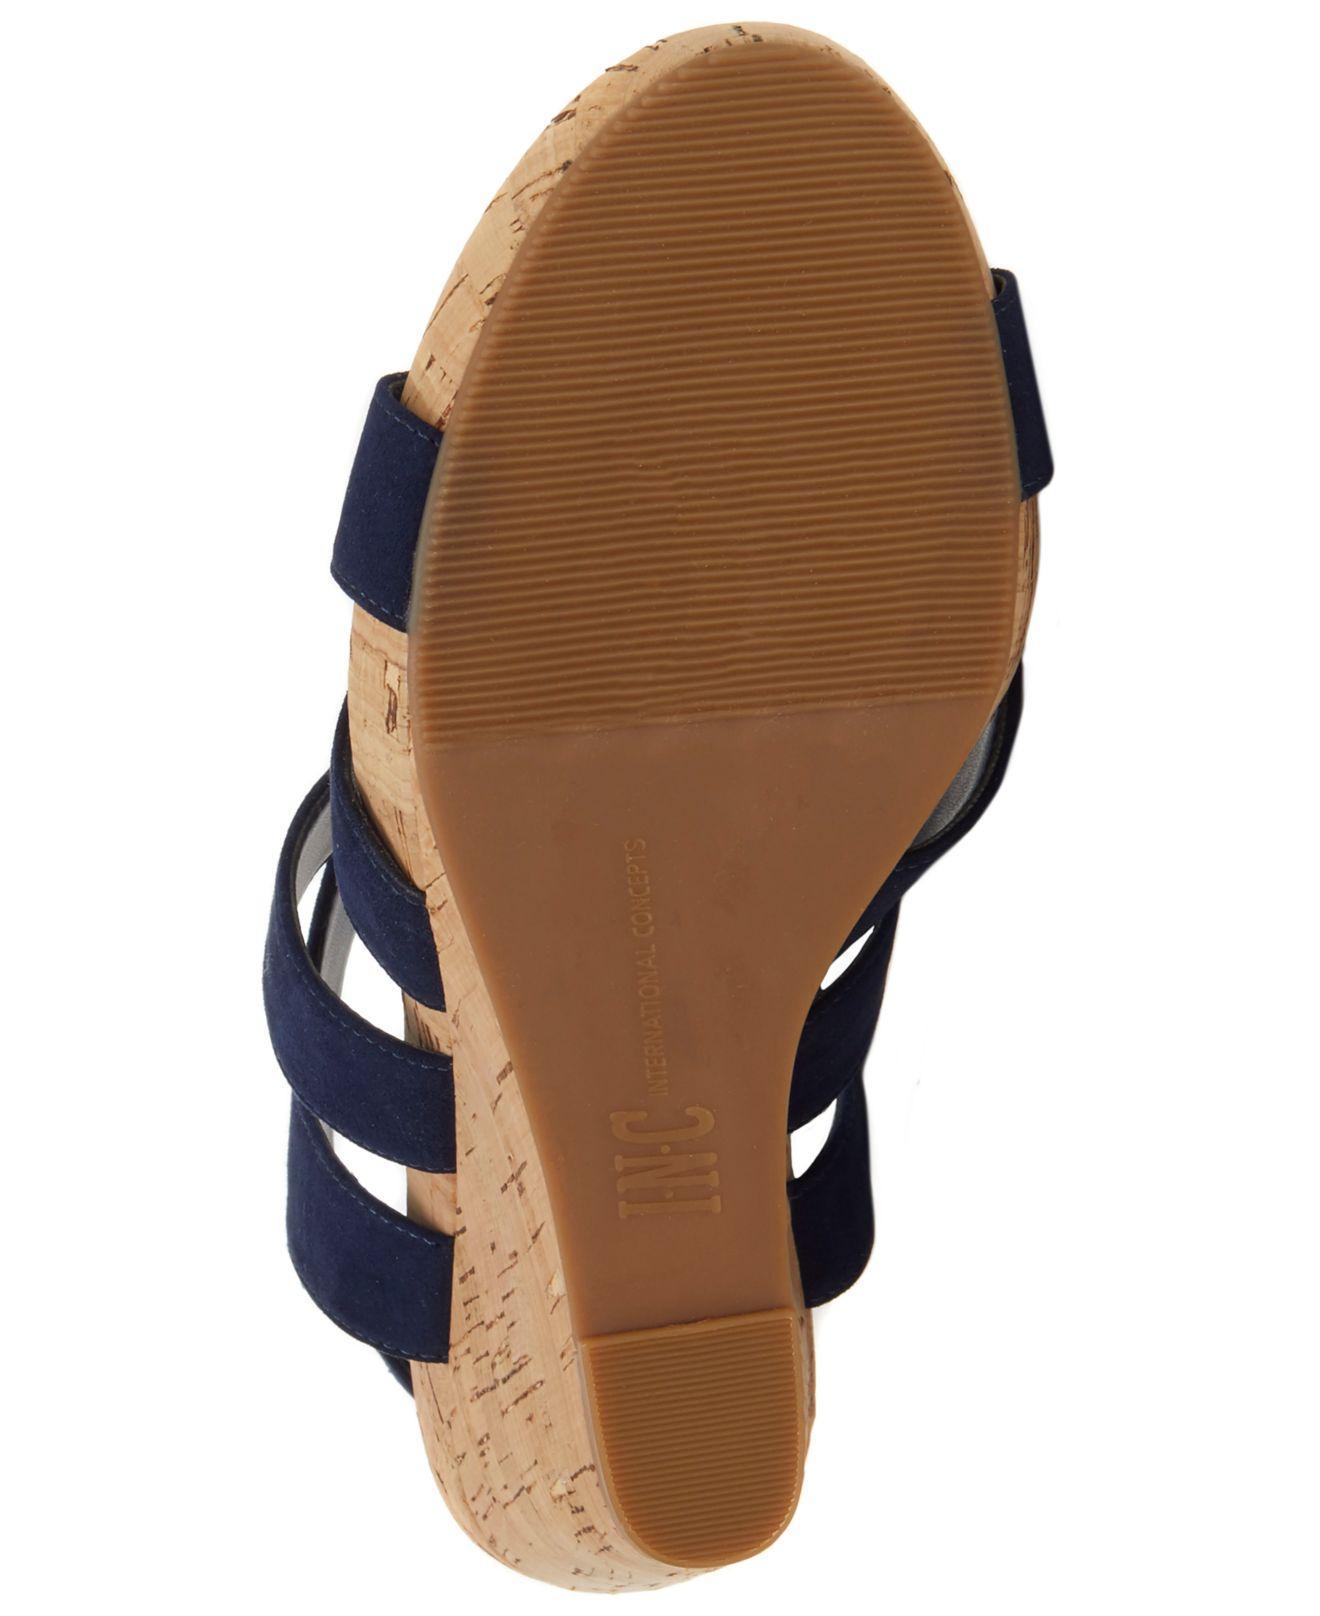 ee0a2c83ea66 INC International Concepts - Blue Women s Landor Strappy Wedge Sandals -  Lyst. View fullscreen